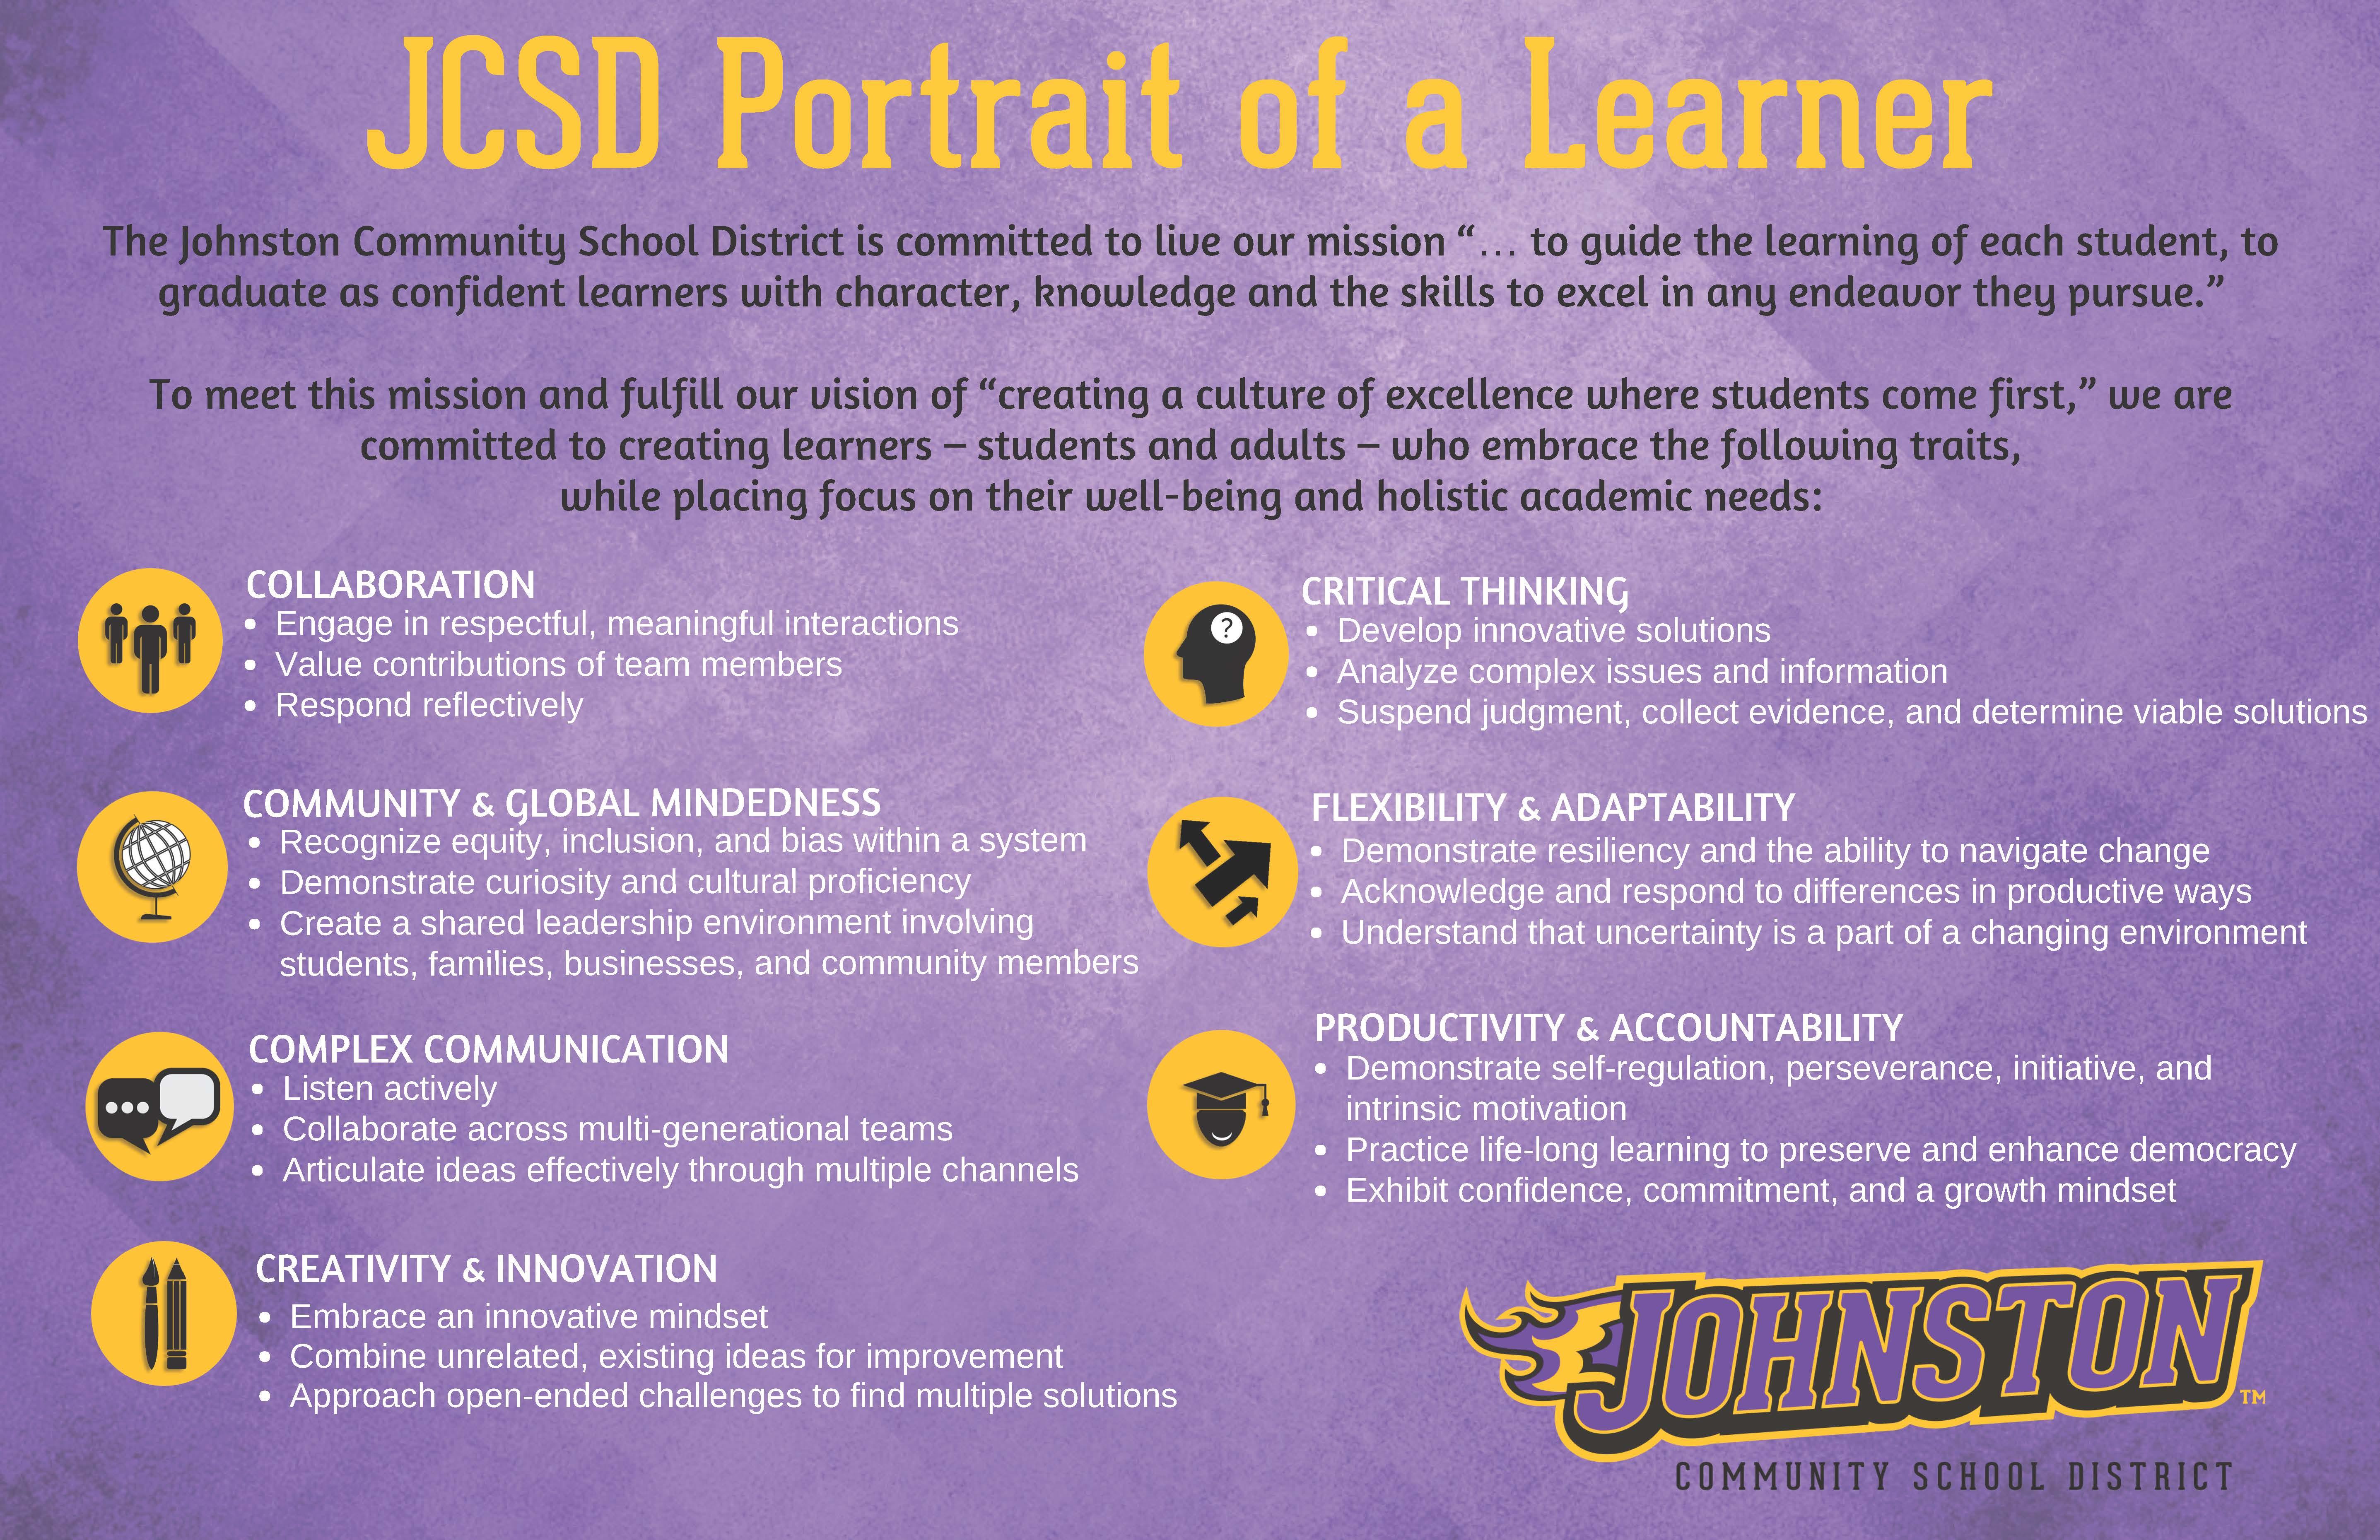 JCSD Portrait of a Learner